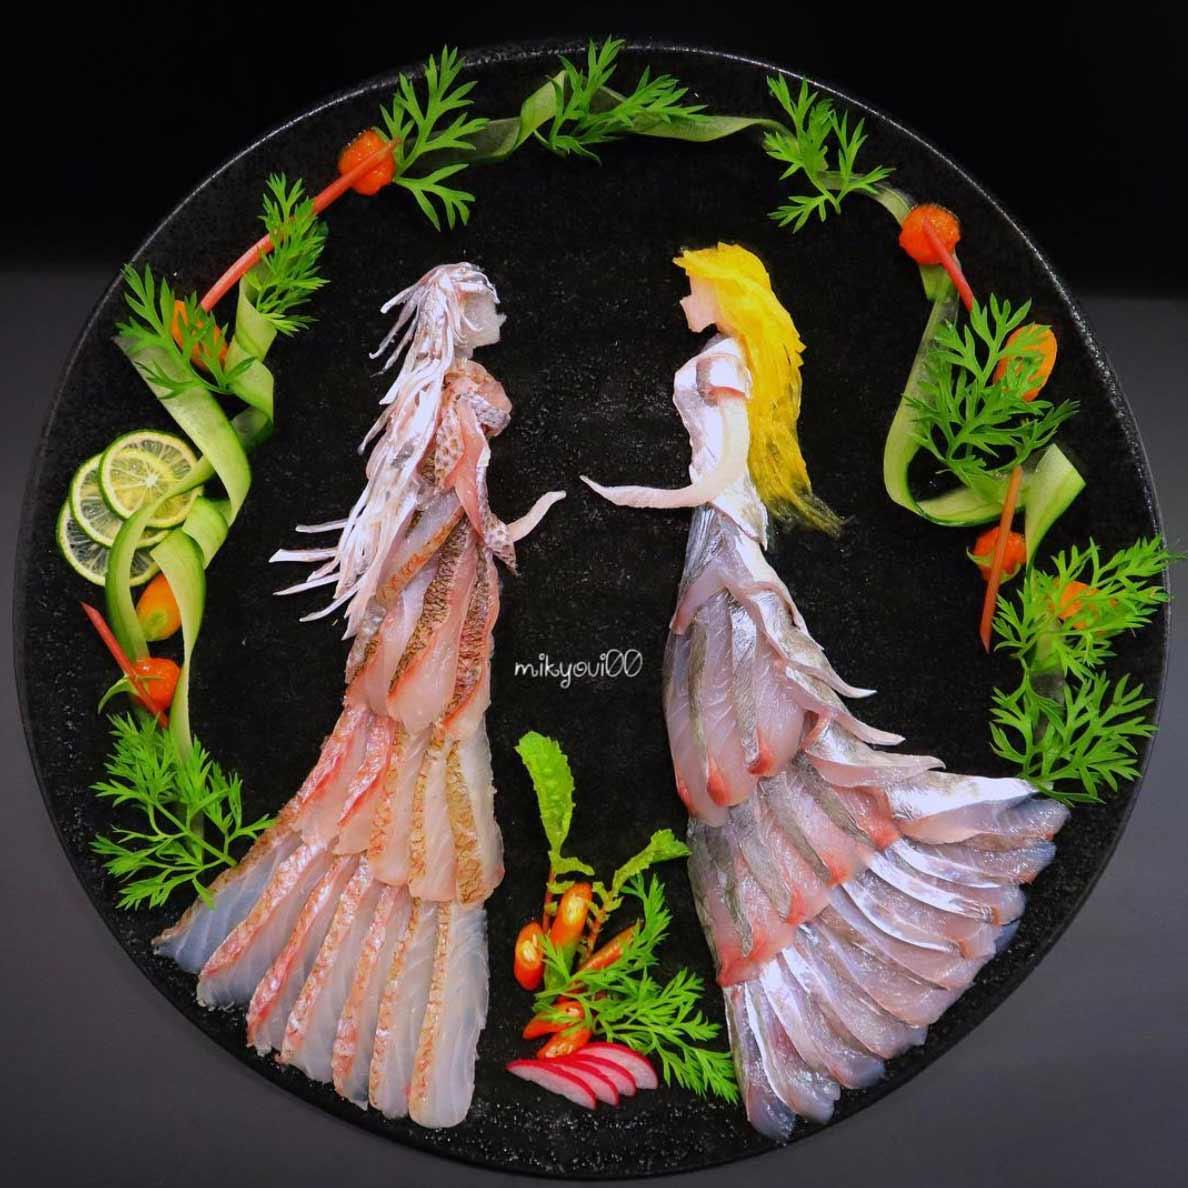 Wundervolle Sashimi-Kunstwerke von mikyou mikyou-sashimi-art-sushi-fischbilder_05